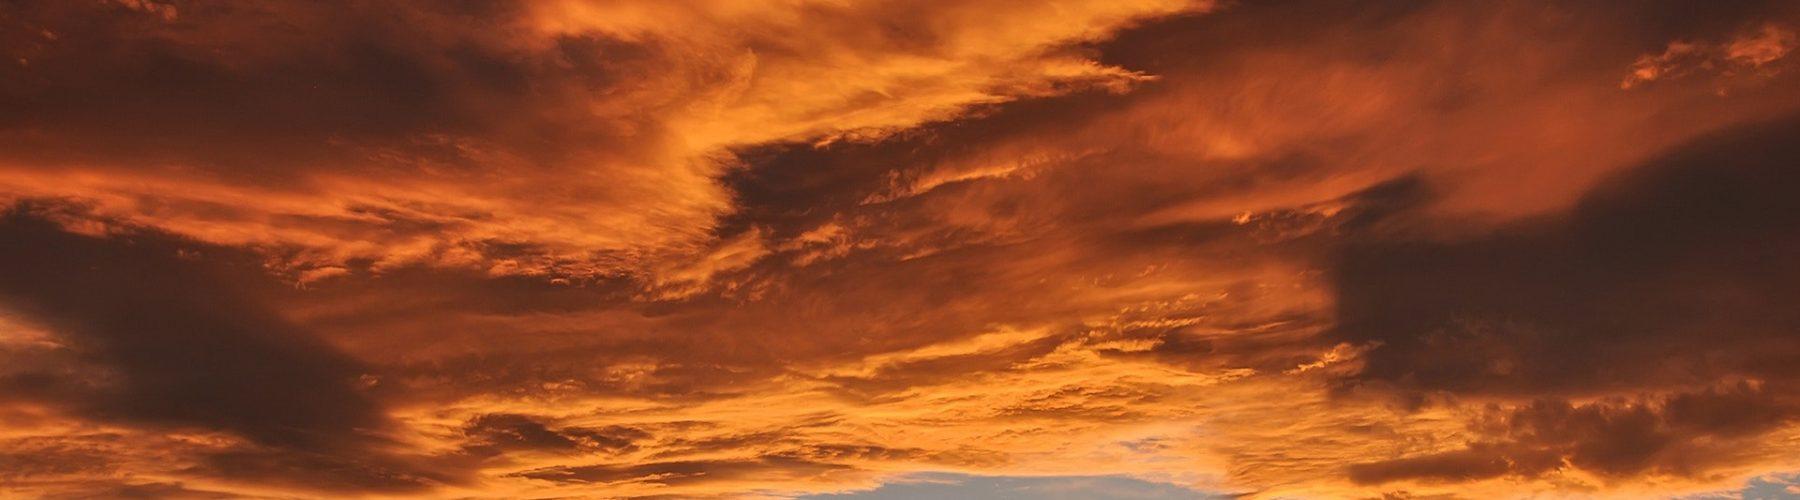 beautiful-clouds-evening-35857